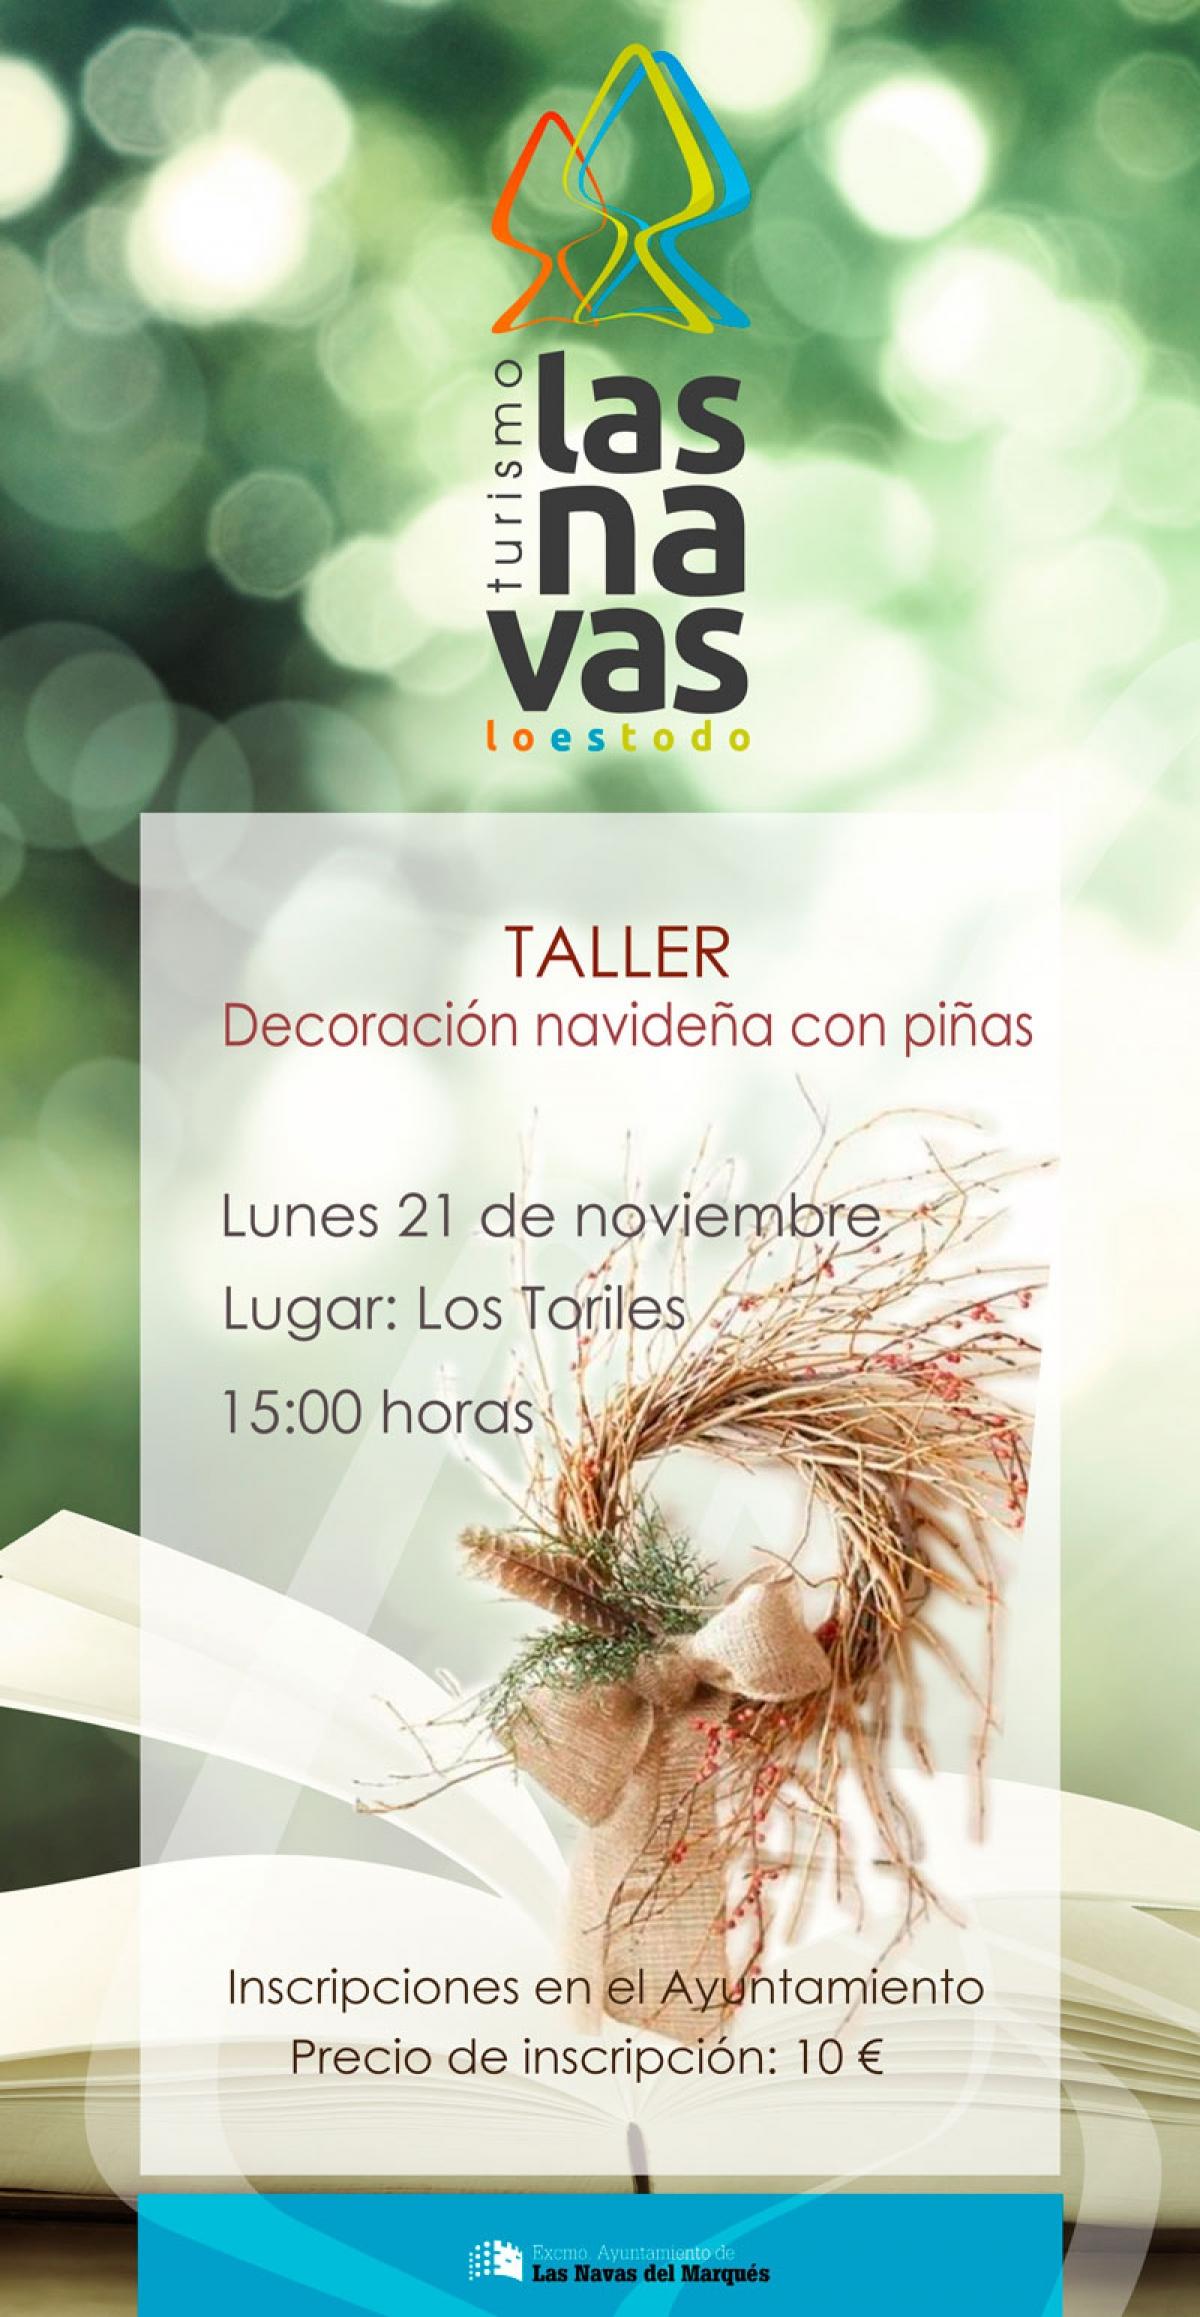 Taller de decoraci n navide a con pi as turismo las navas - Decoracion navidena con pinas ...